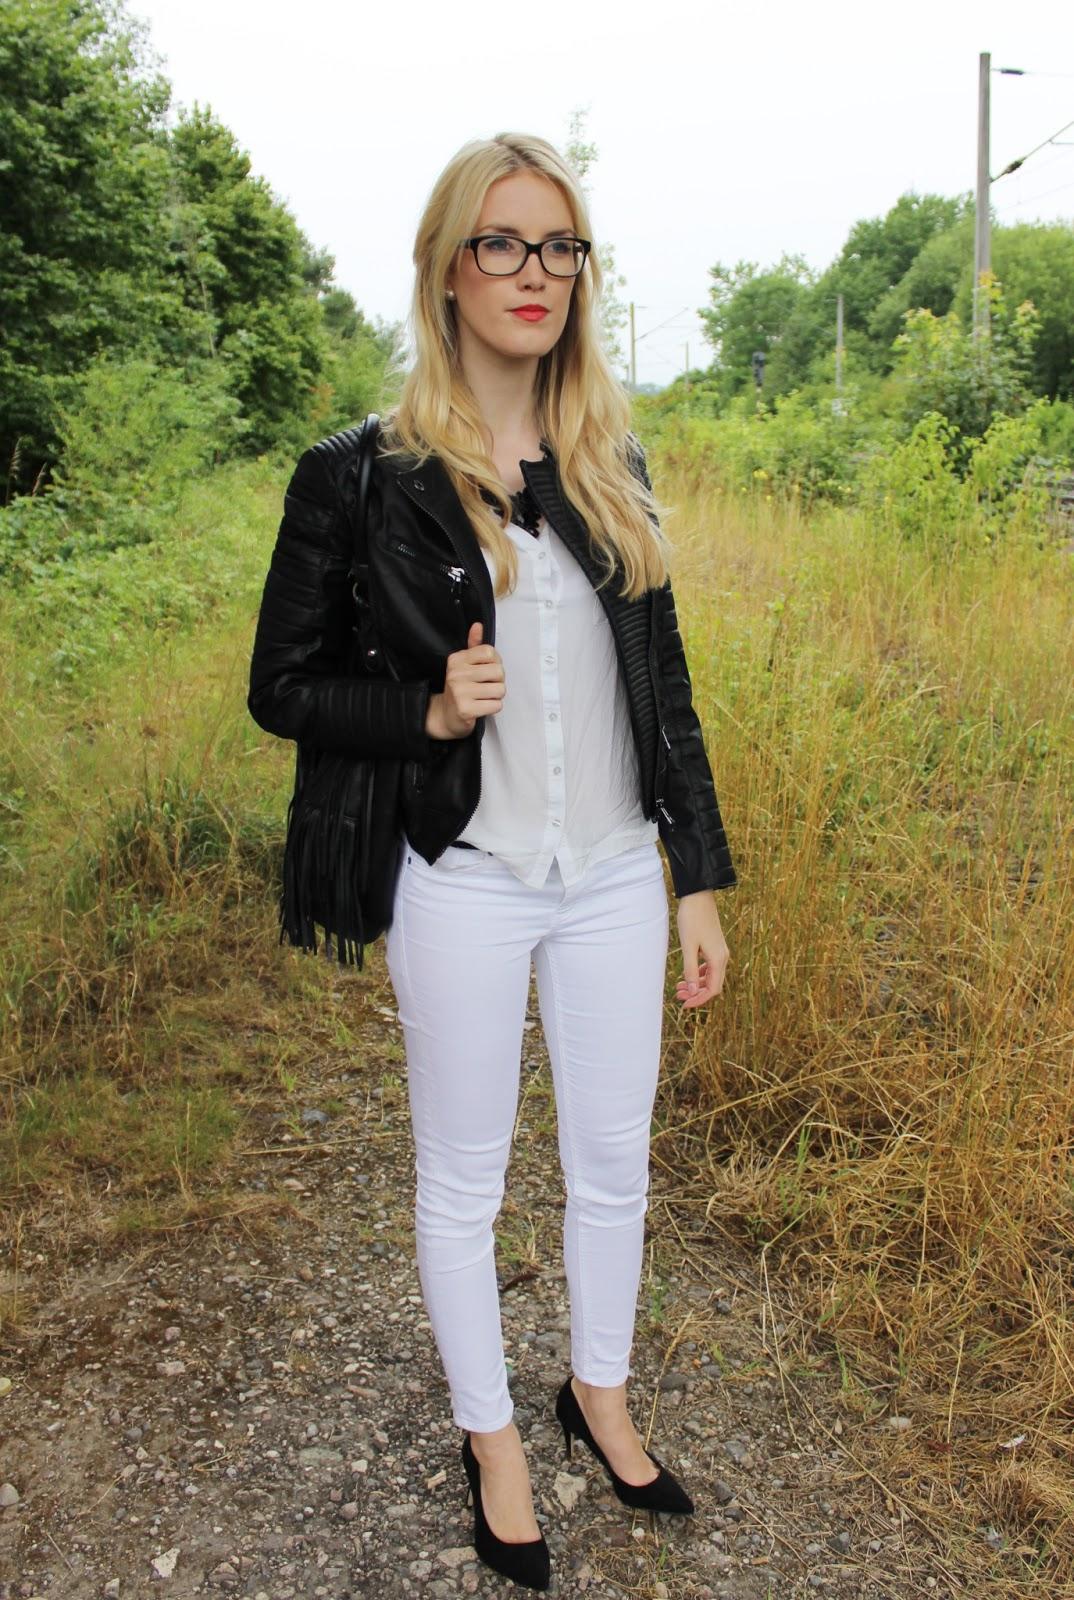 TheBlondeLion Outfit Allwhite white Leder Fransen Lederjacke Brille Statement kette